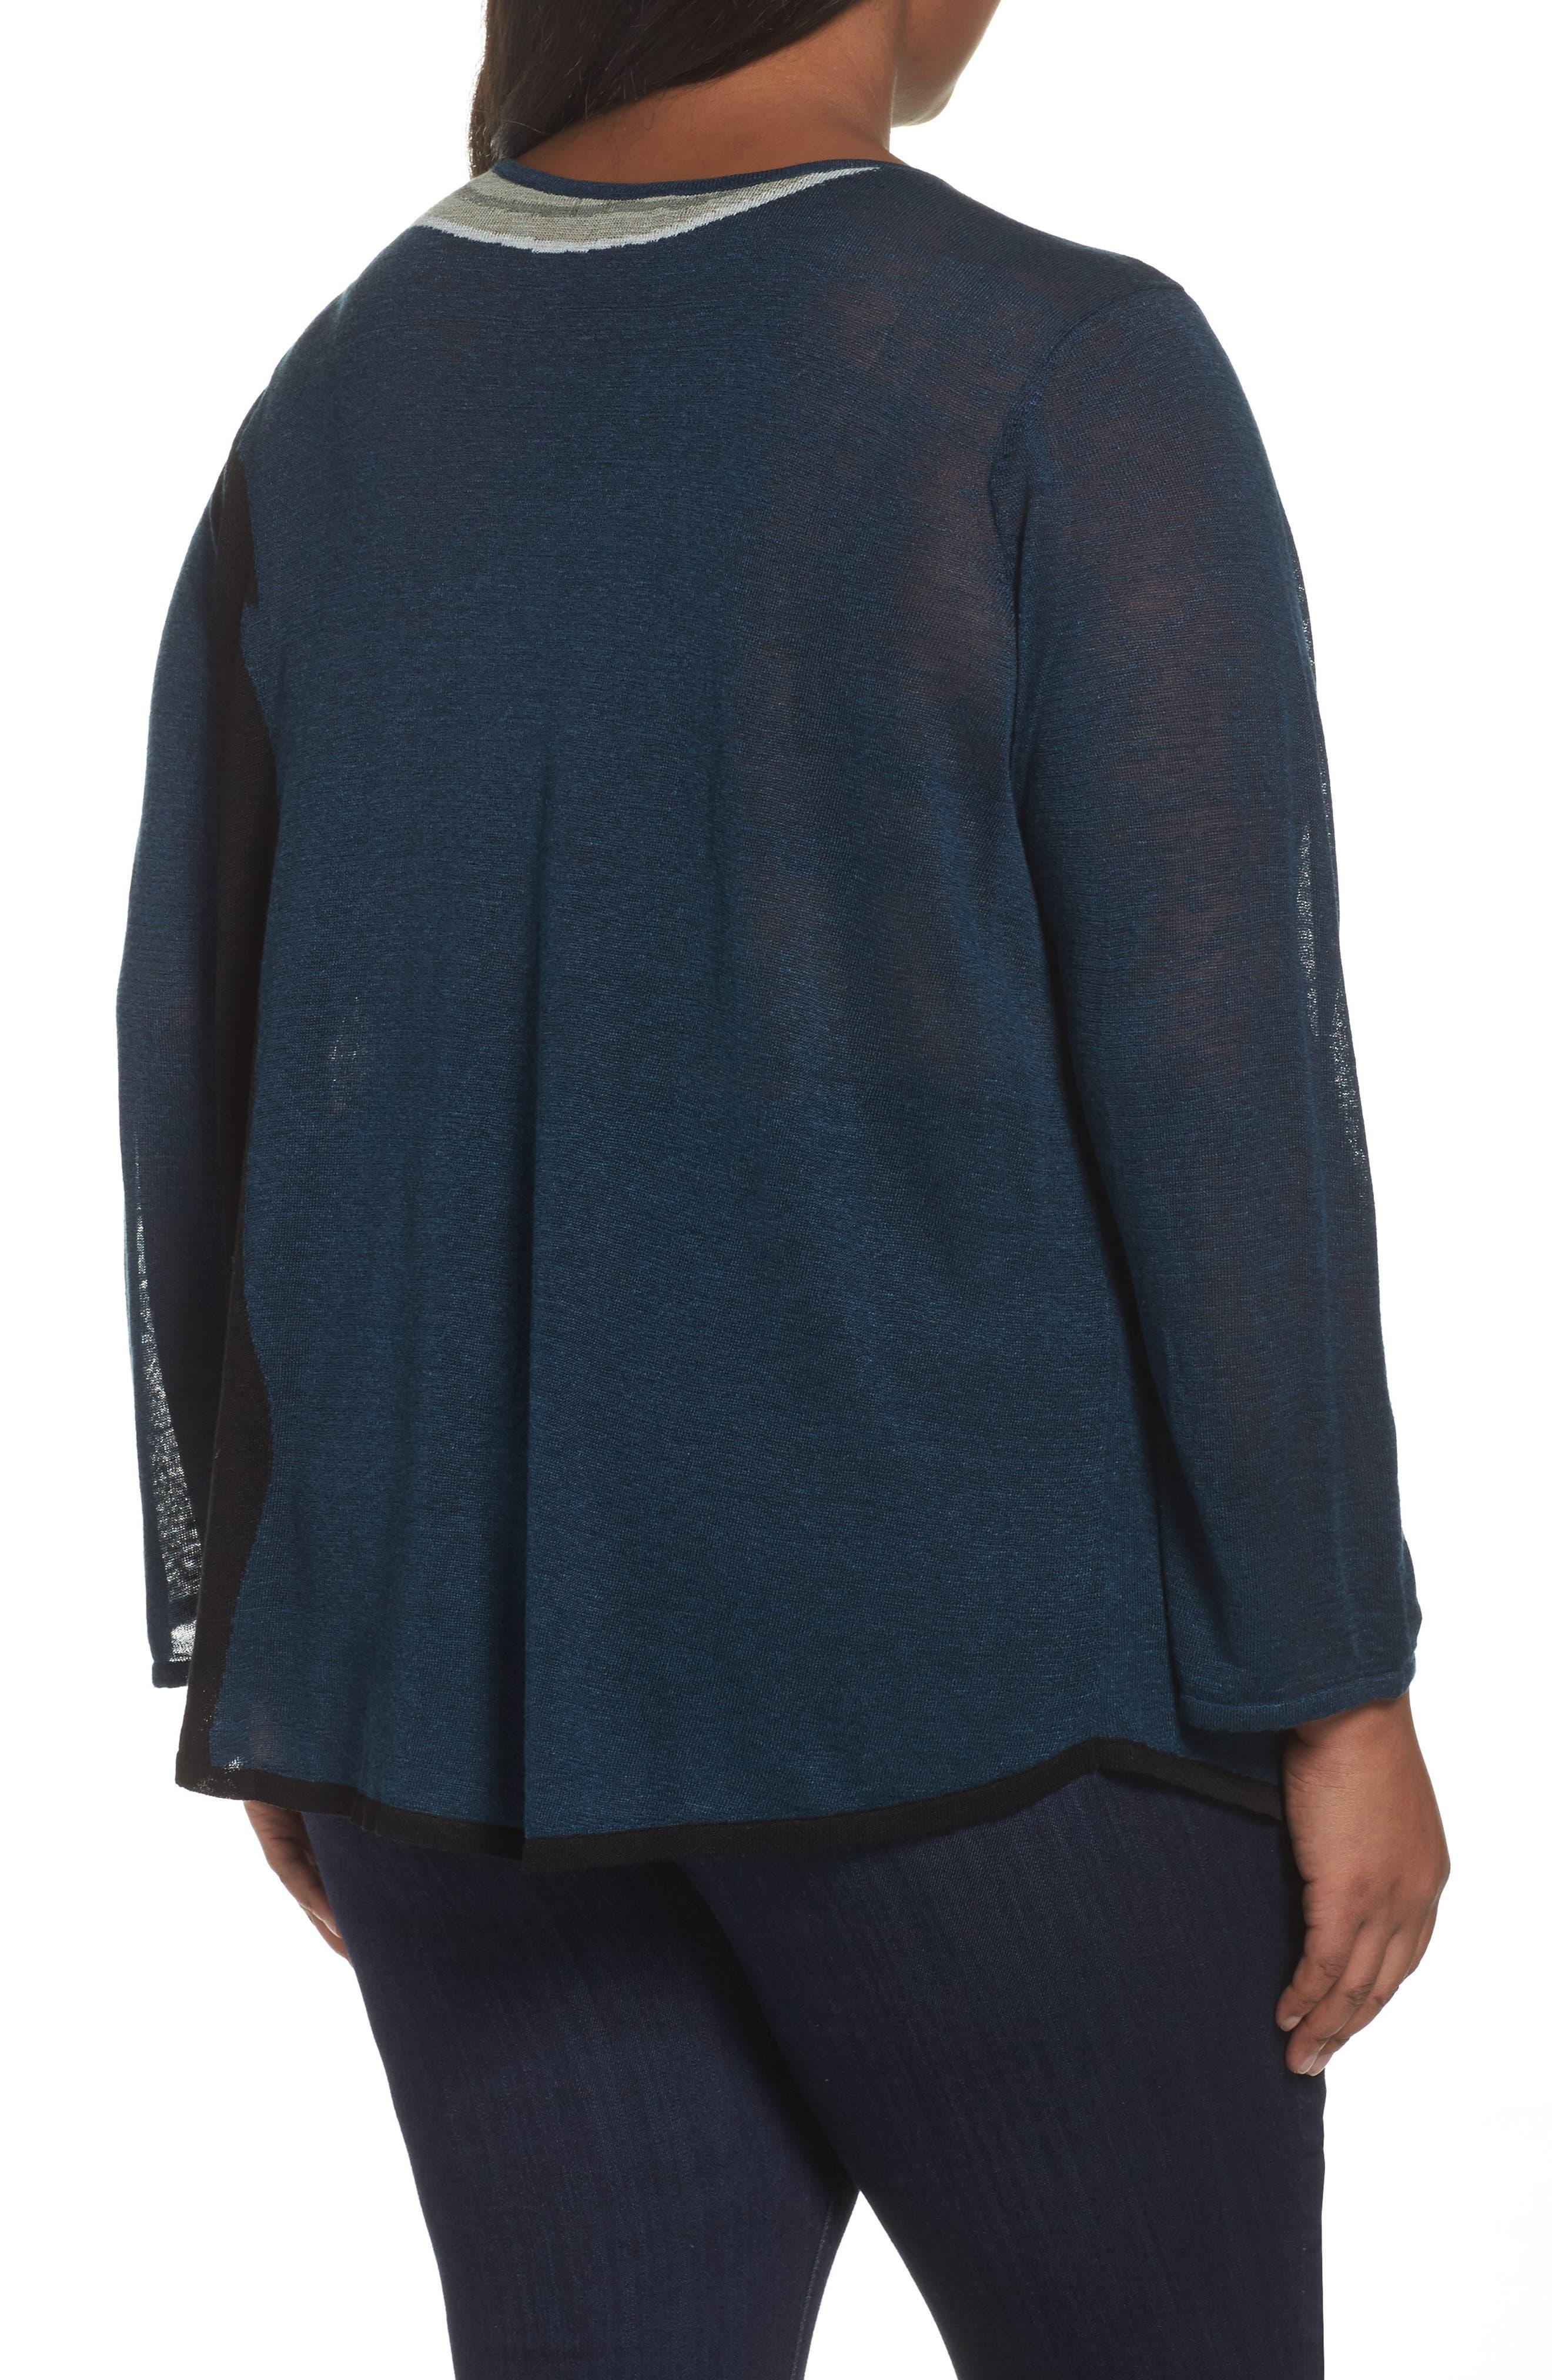 Wild Thyme Sweater,                             Alternate thumbnail 2, color,                             Multi